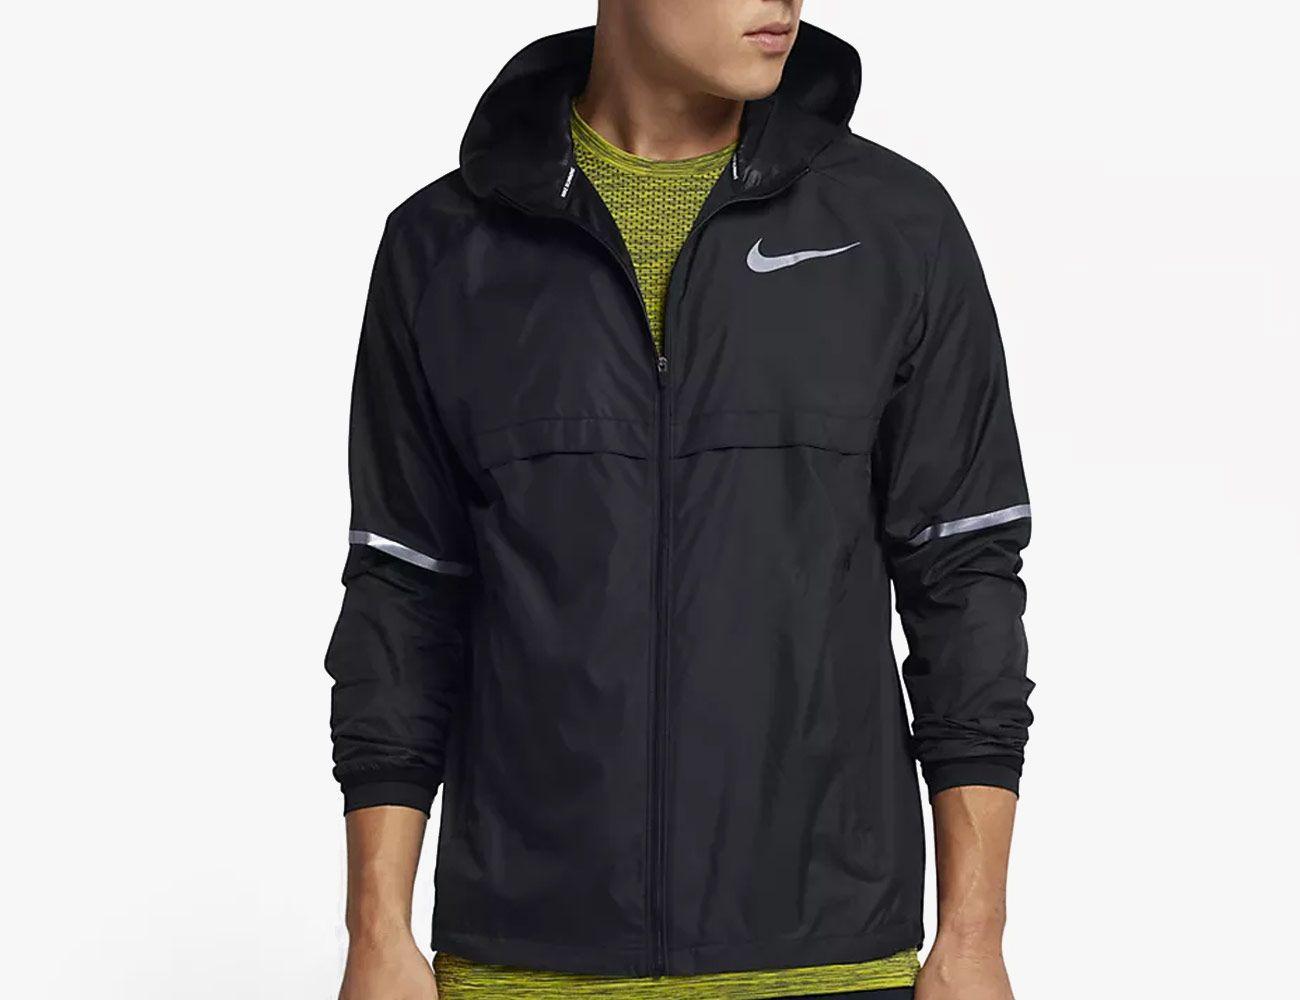 Running Rain Gear The Best To Wear In • Jackets Patrol sQdhrtC